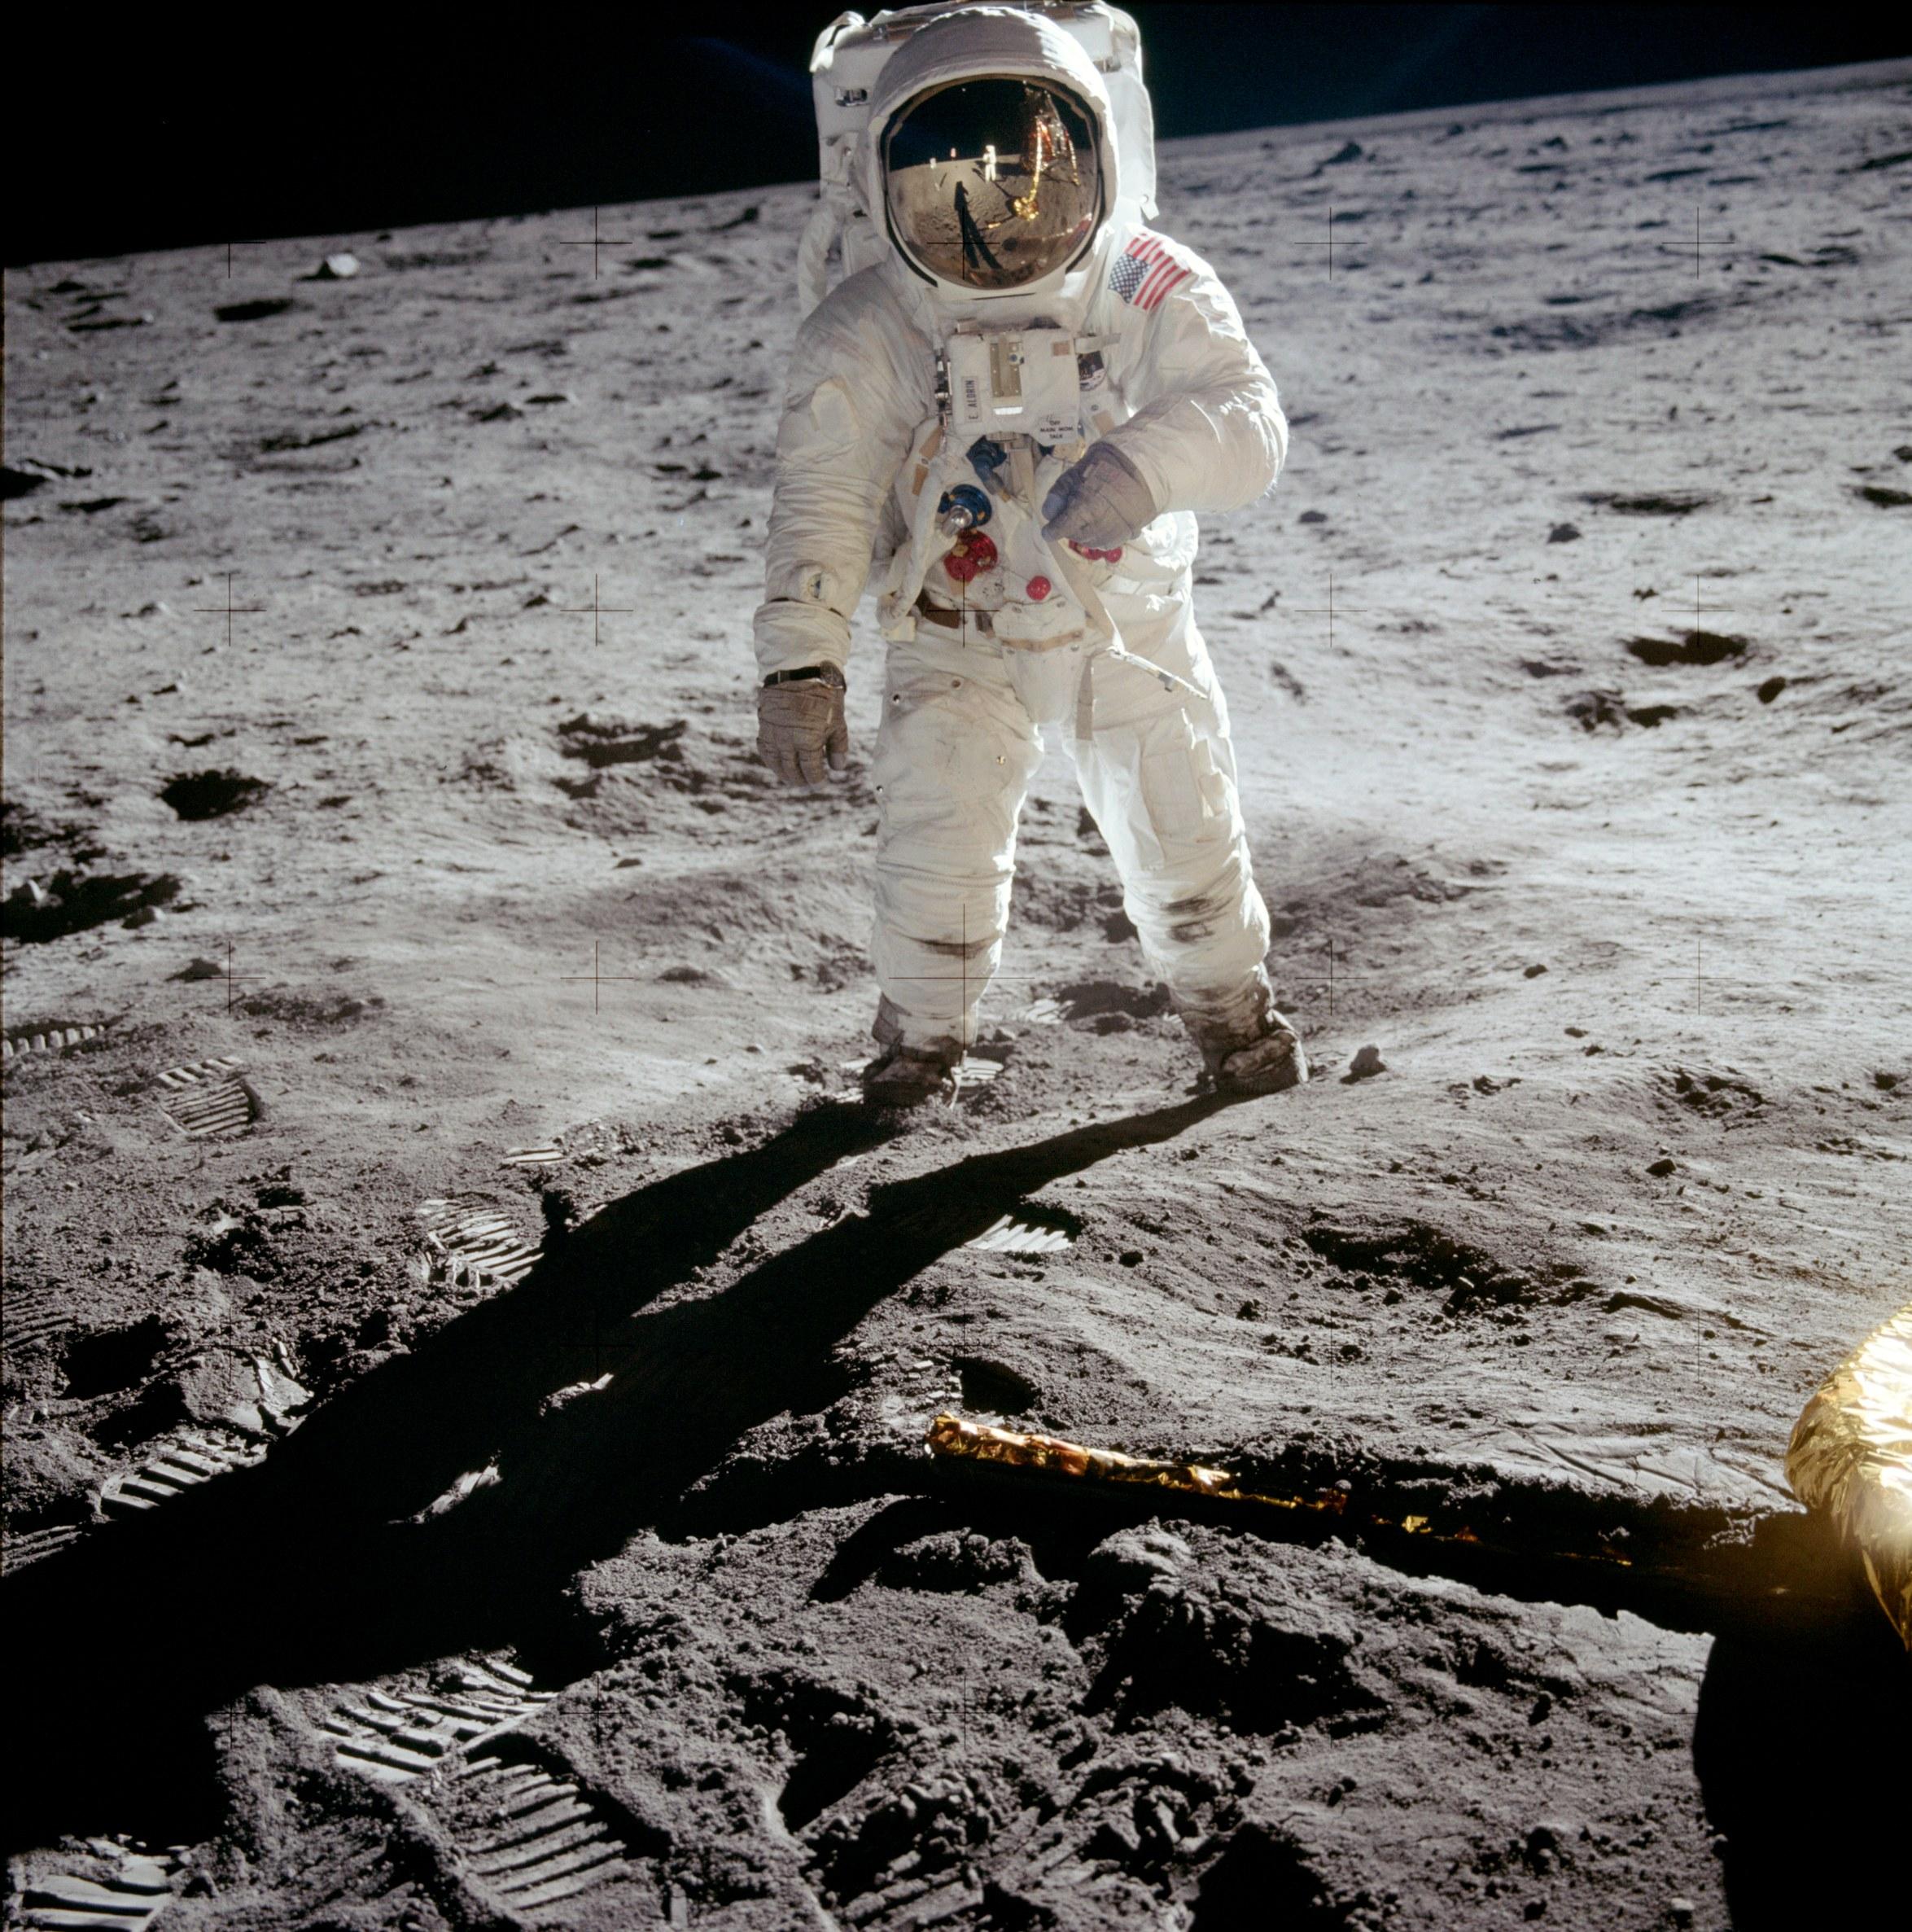 Buzz Aldrin on the Moon - 21 July 1969